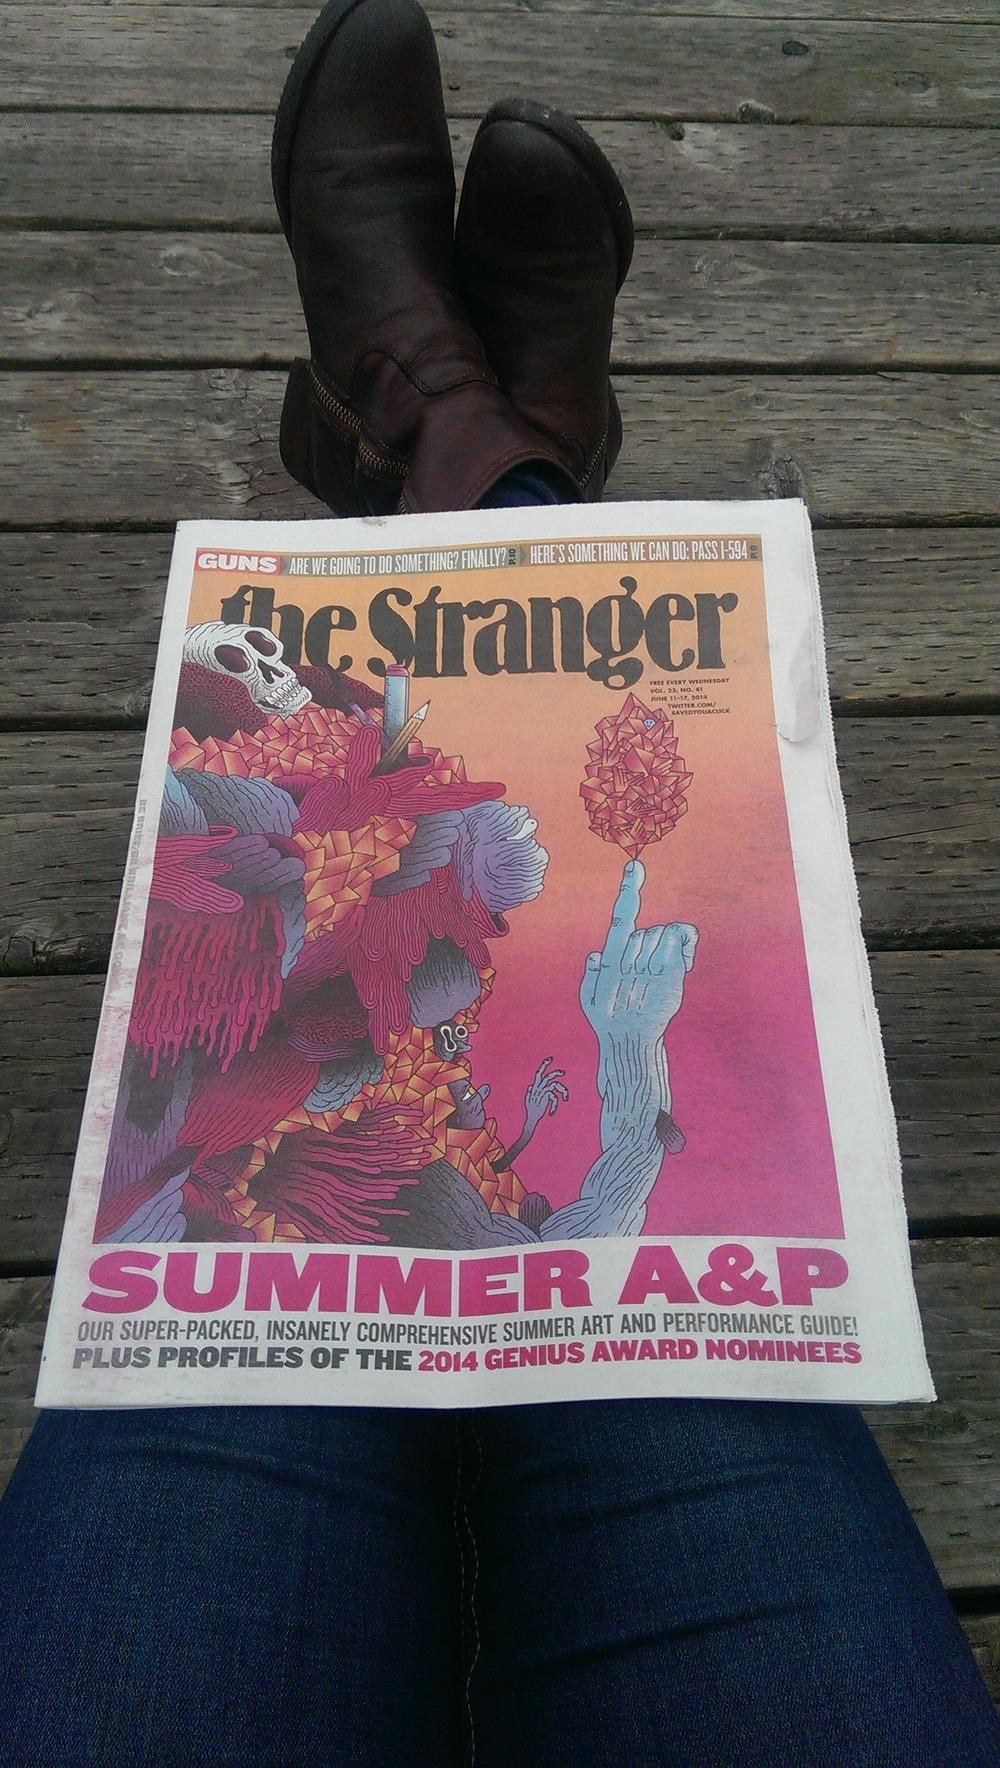 05 - The Stranger local paper